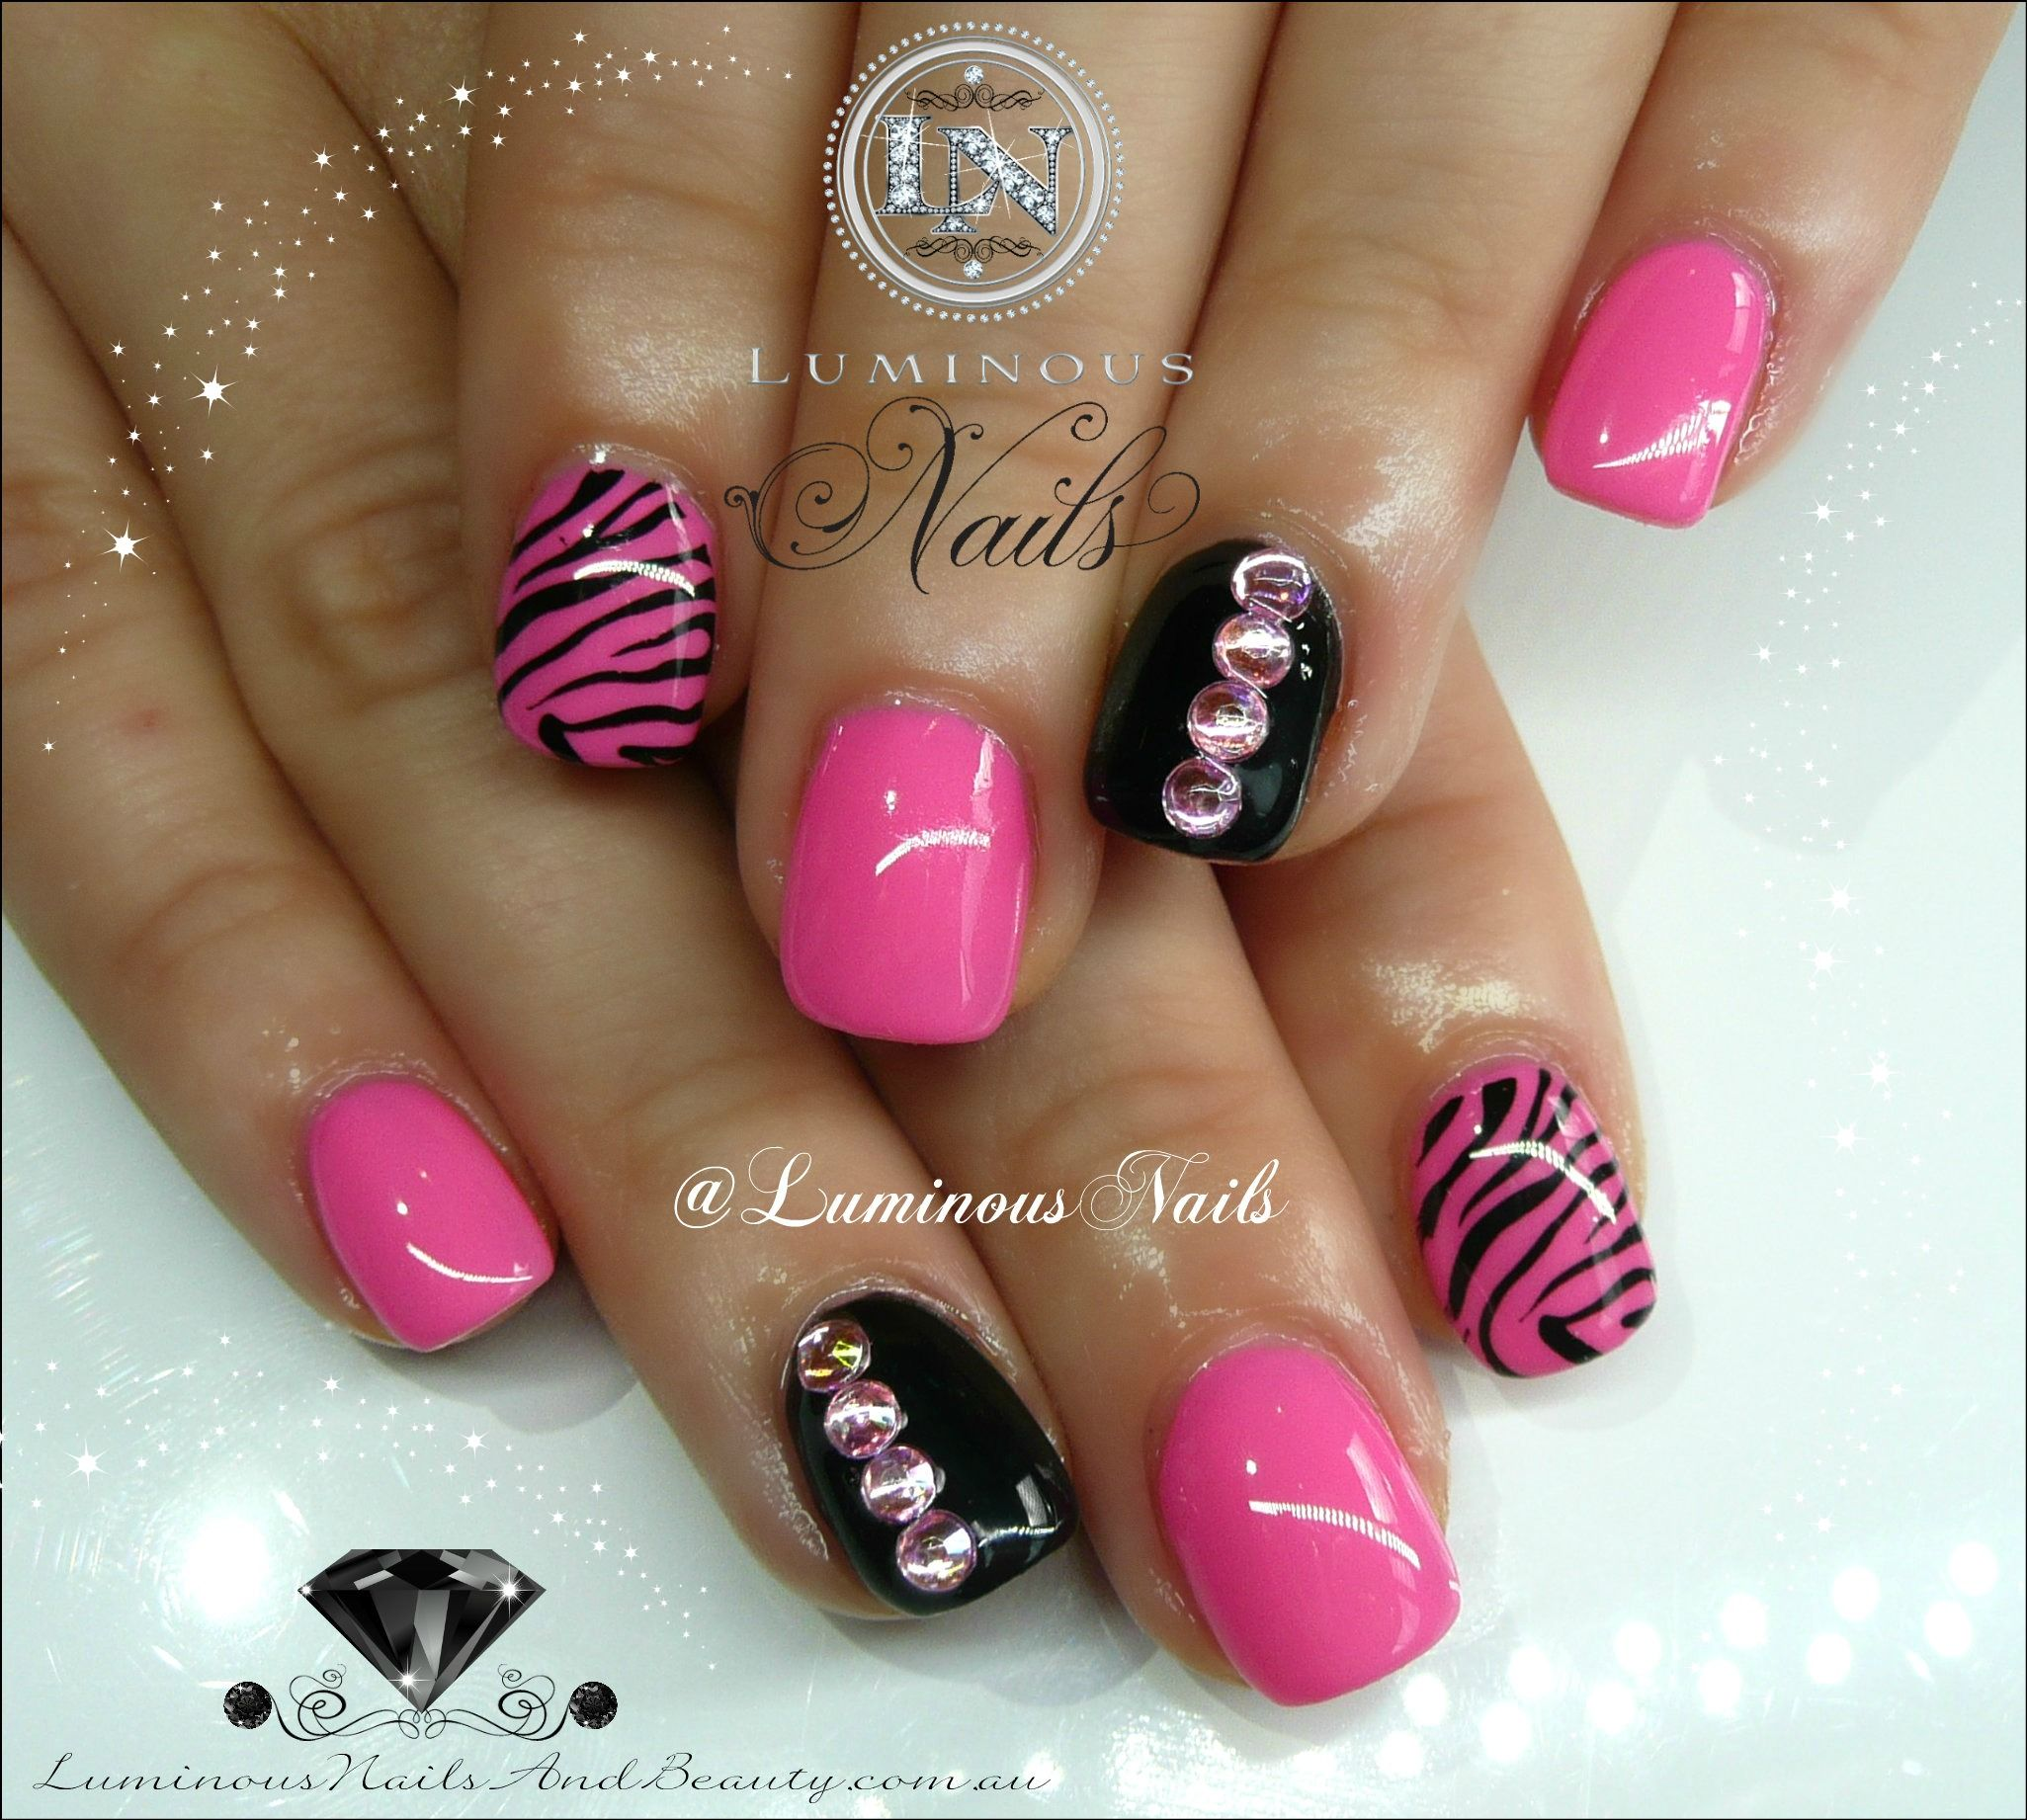 Cute Hot Pink Black Nails With Zebra Print Bling Nails Design With Rhinestones Luminous Nails Pink Black Nails